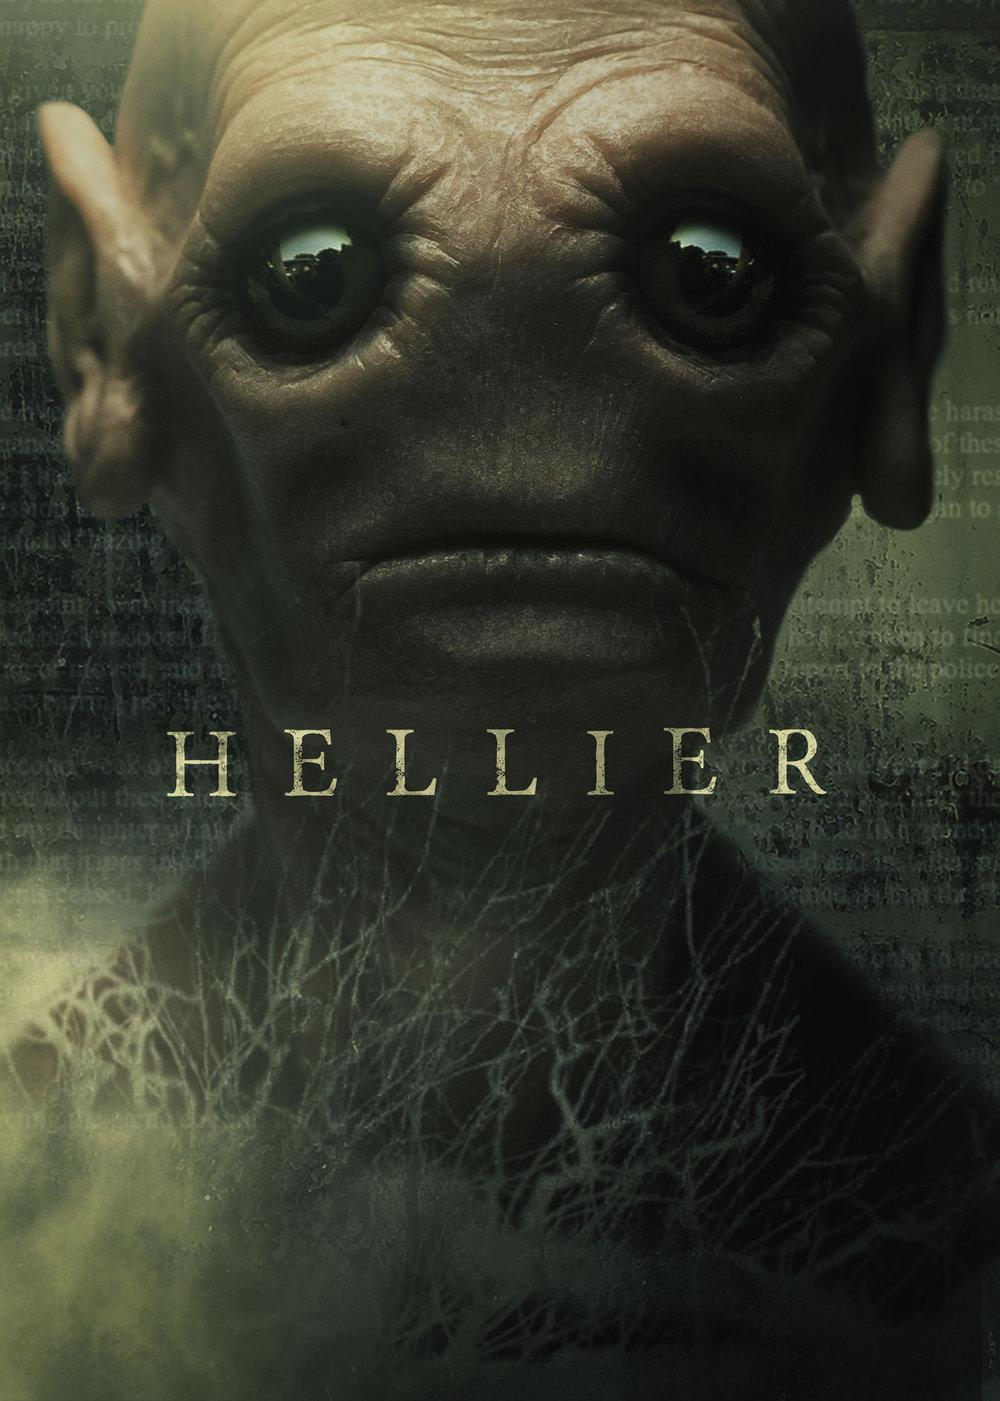 Hellier_2x3-2b.jpg